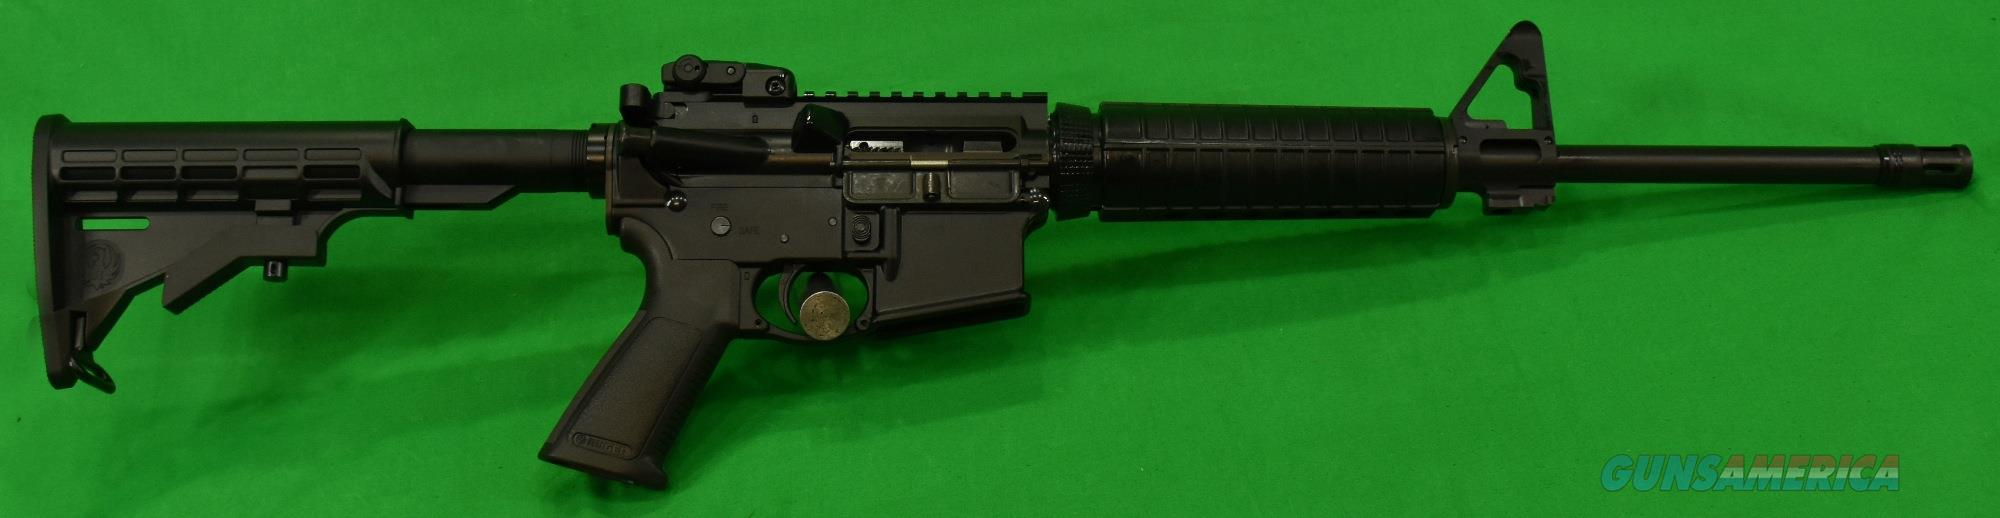 AR-556 Black 5.56mm 16.1In  8500  Guns > Pistols > S Misc Pistols